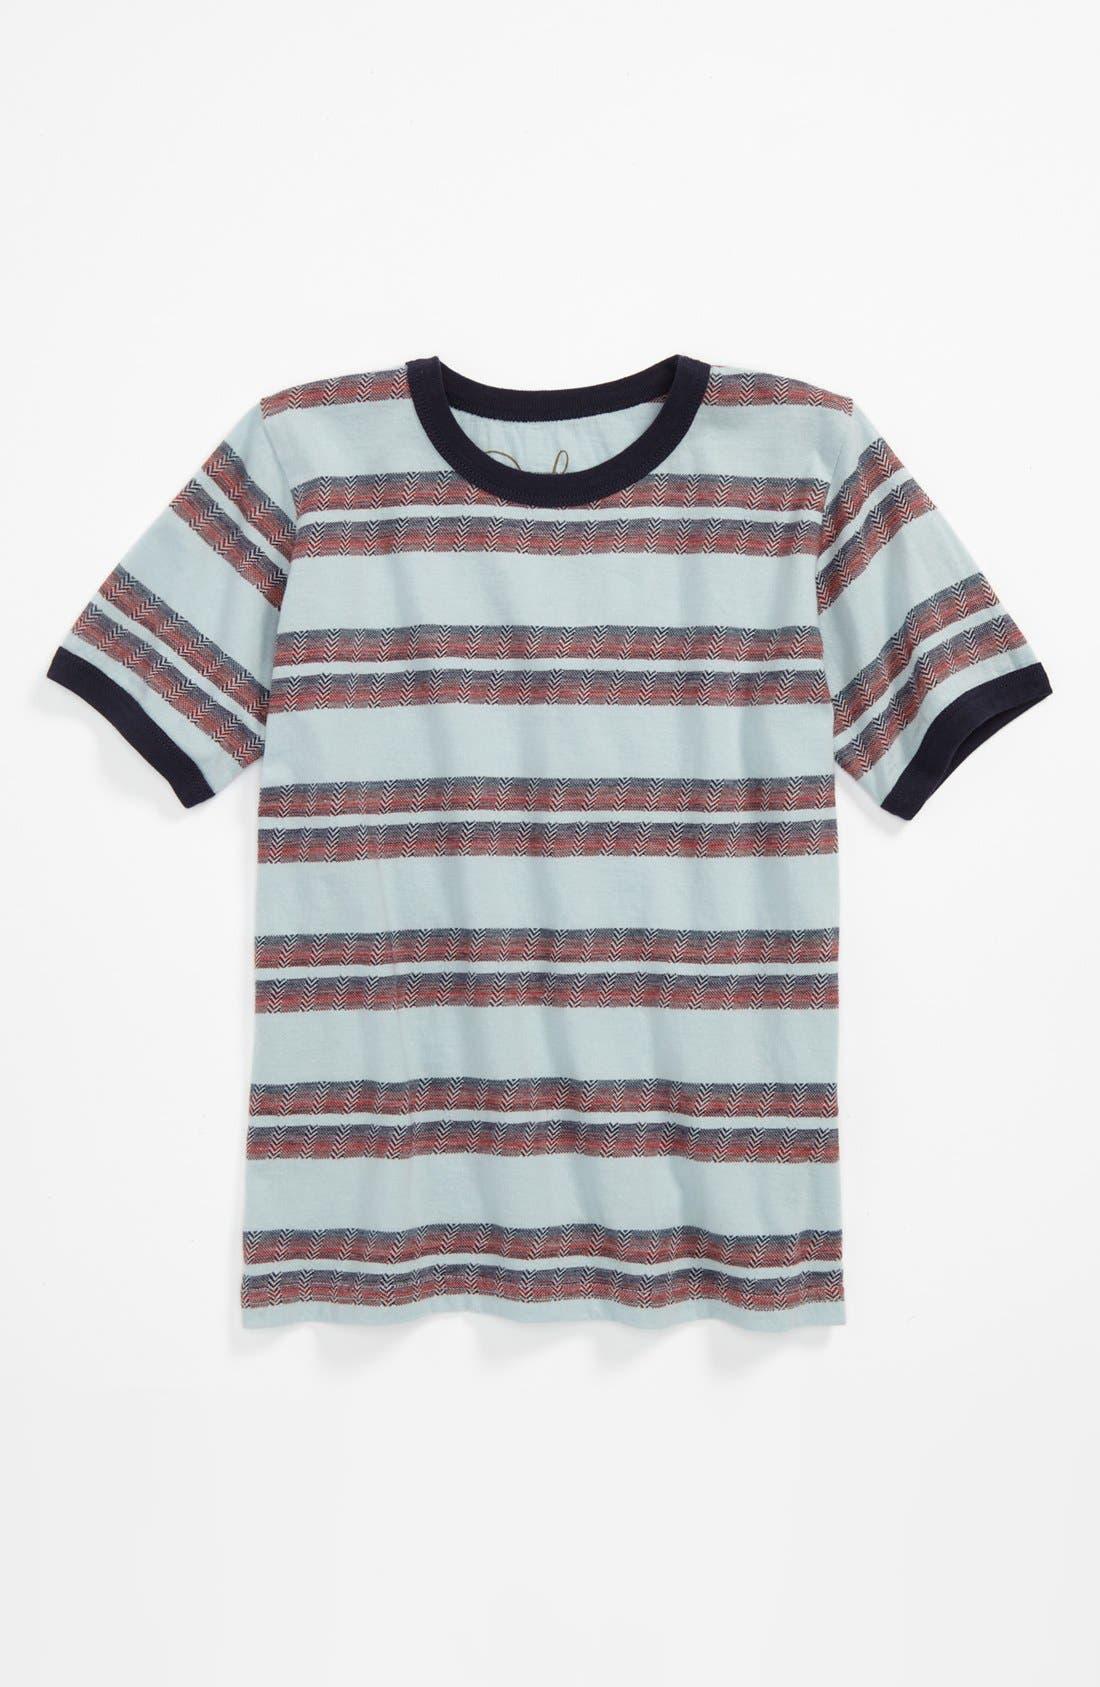 Main Image - Peek 'Mateo' T-Shirt (Toddler Boys &  Little Boys)